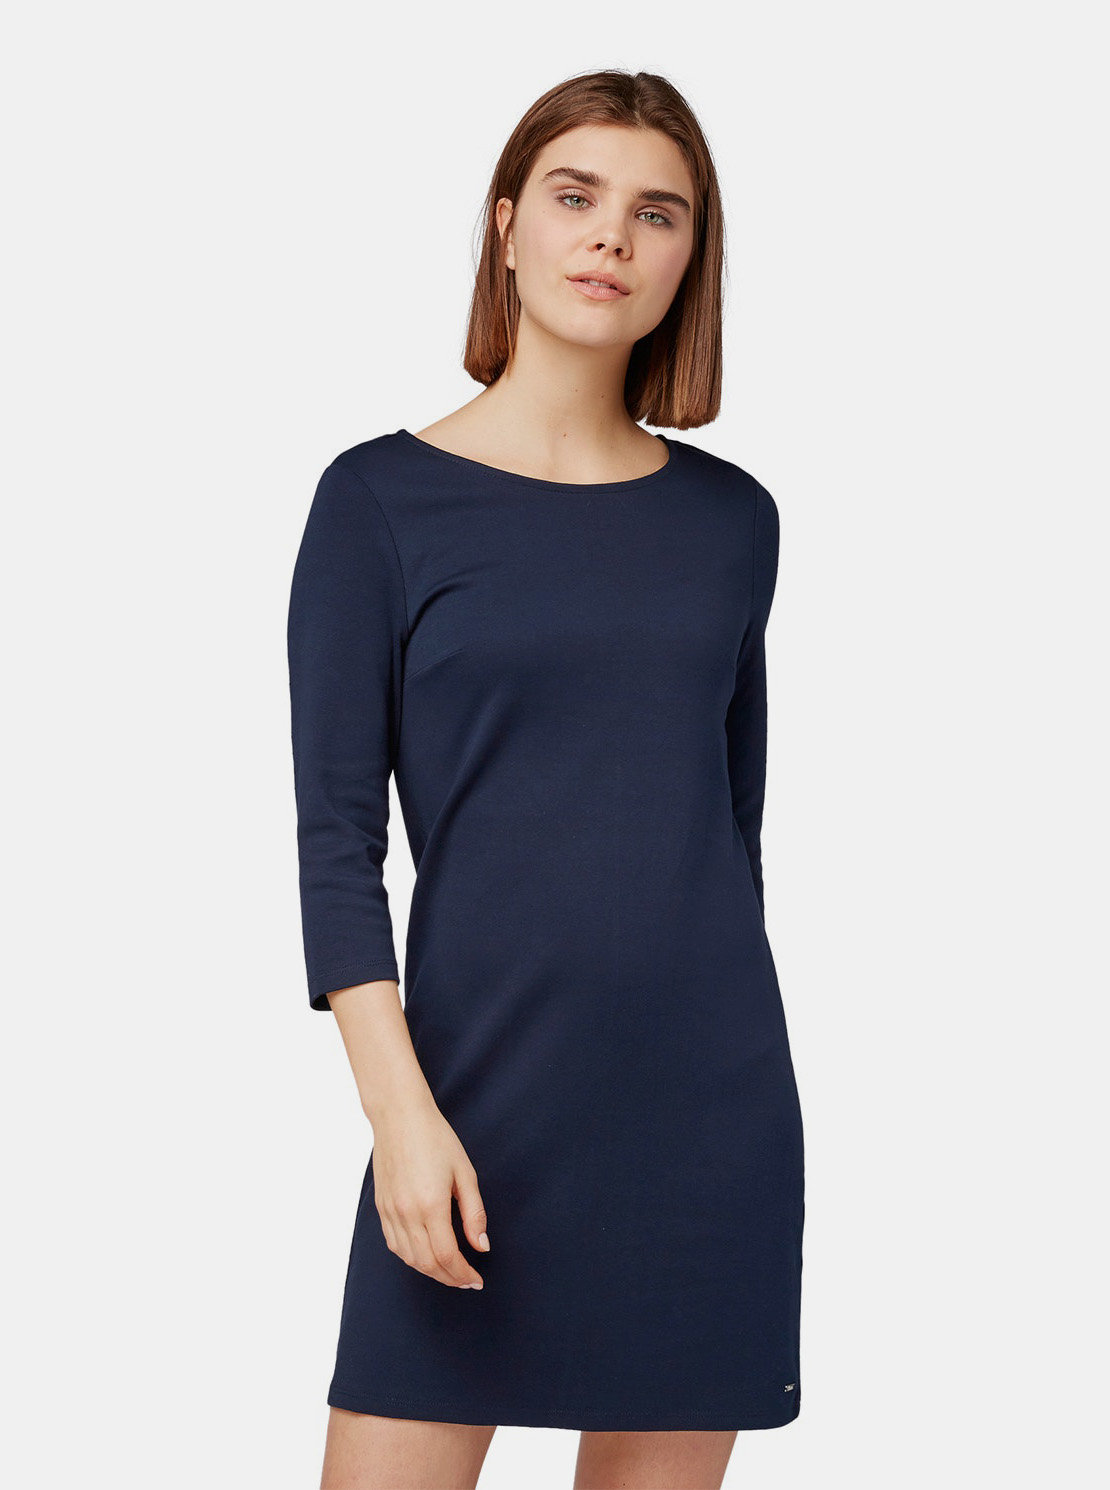 Tmavě modré šaty s 3 4 rukávem Tom Tailor Denim ... 7e8800145ea